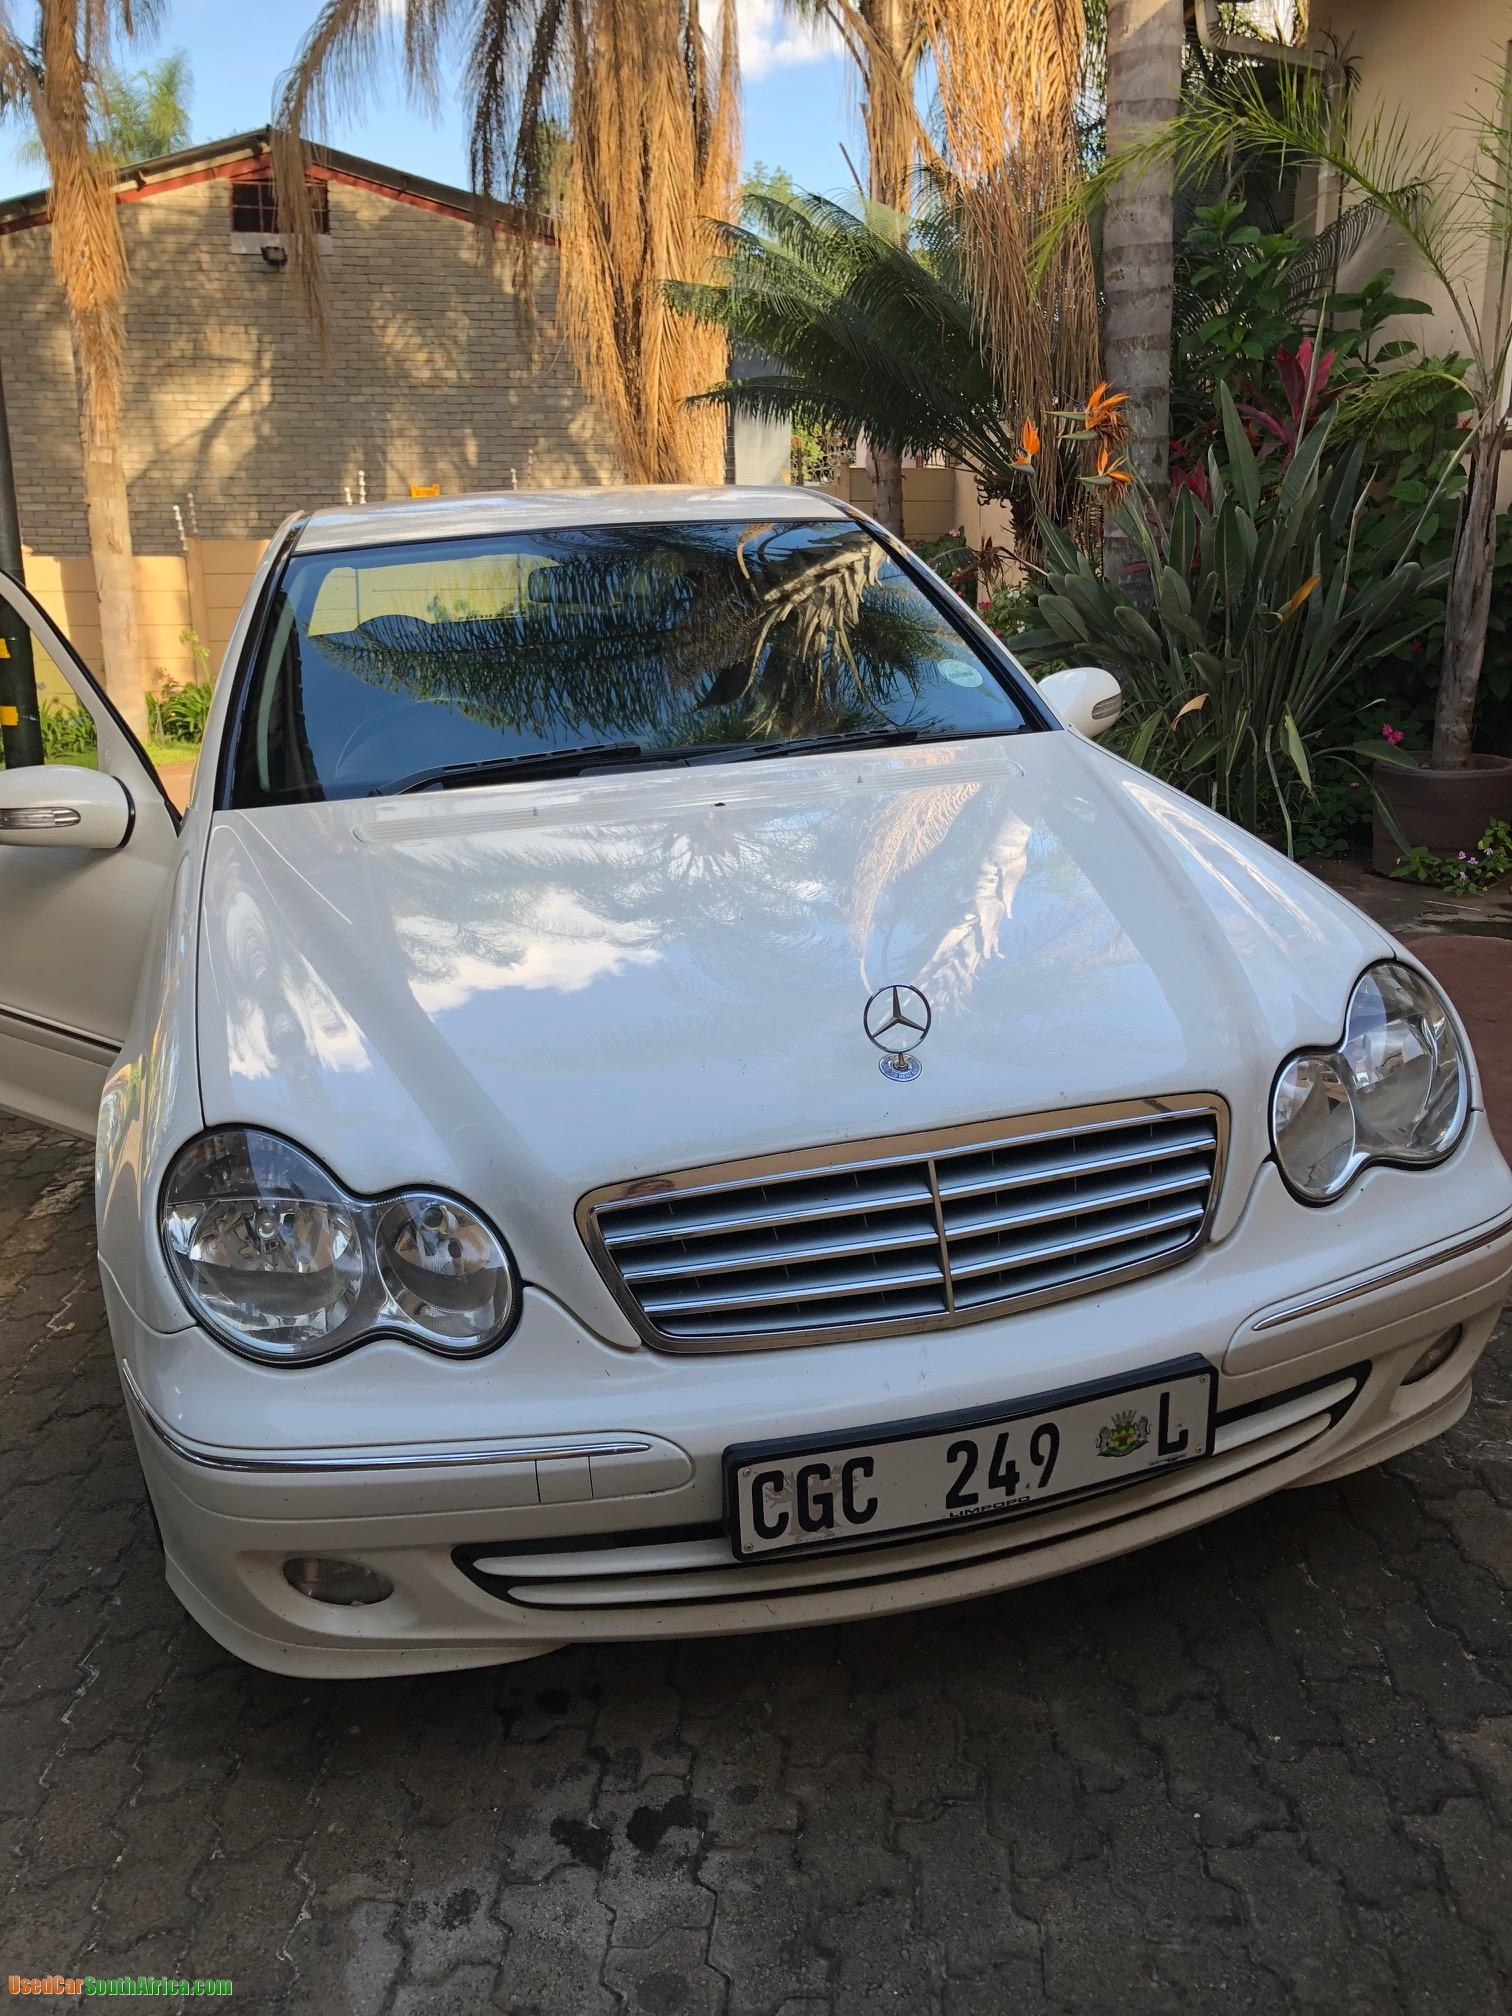 2005 Mercedes Benz C270 C270cdi Elegance Used Car For Sale